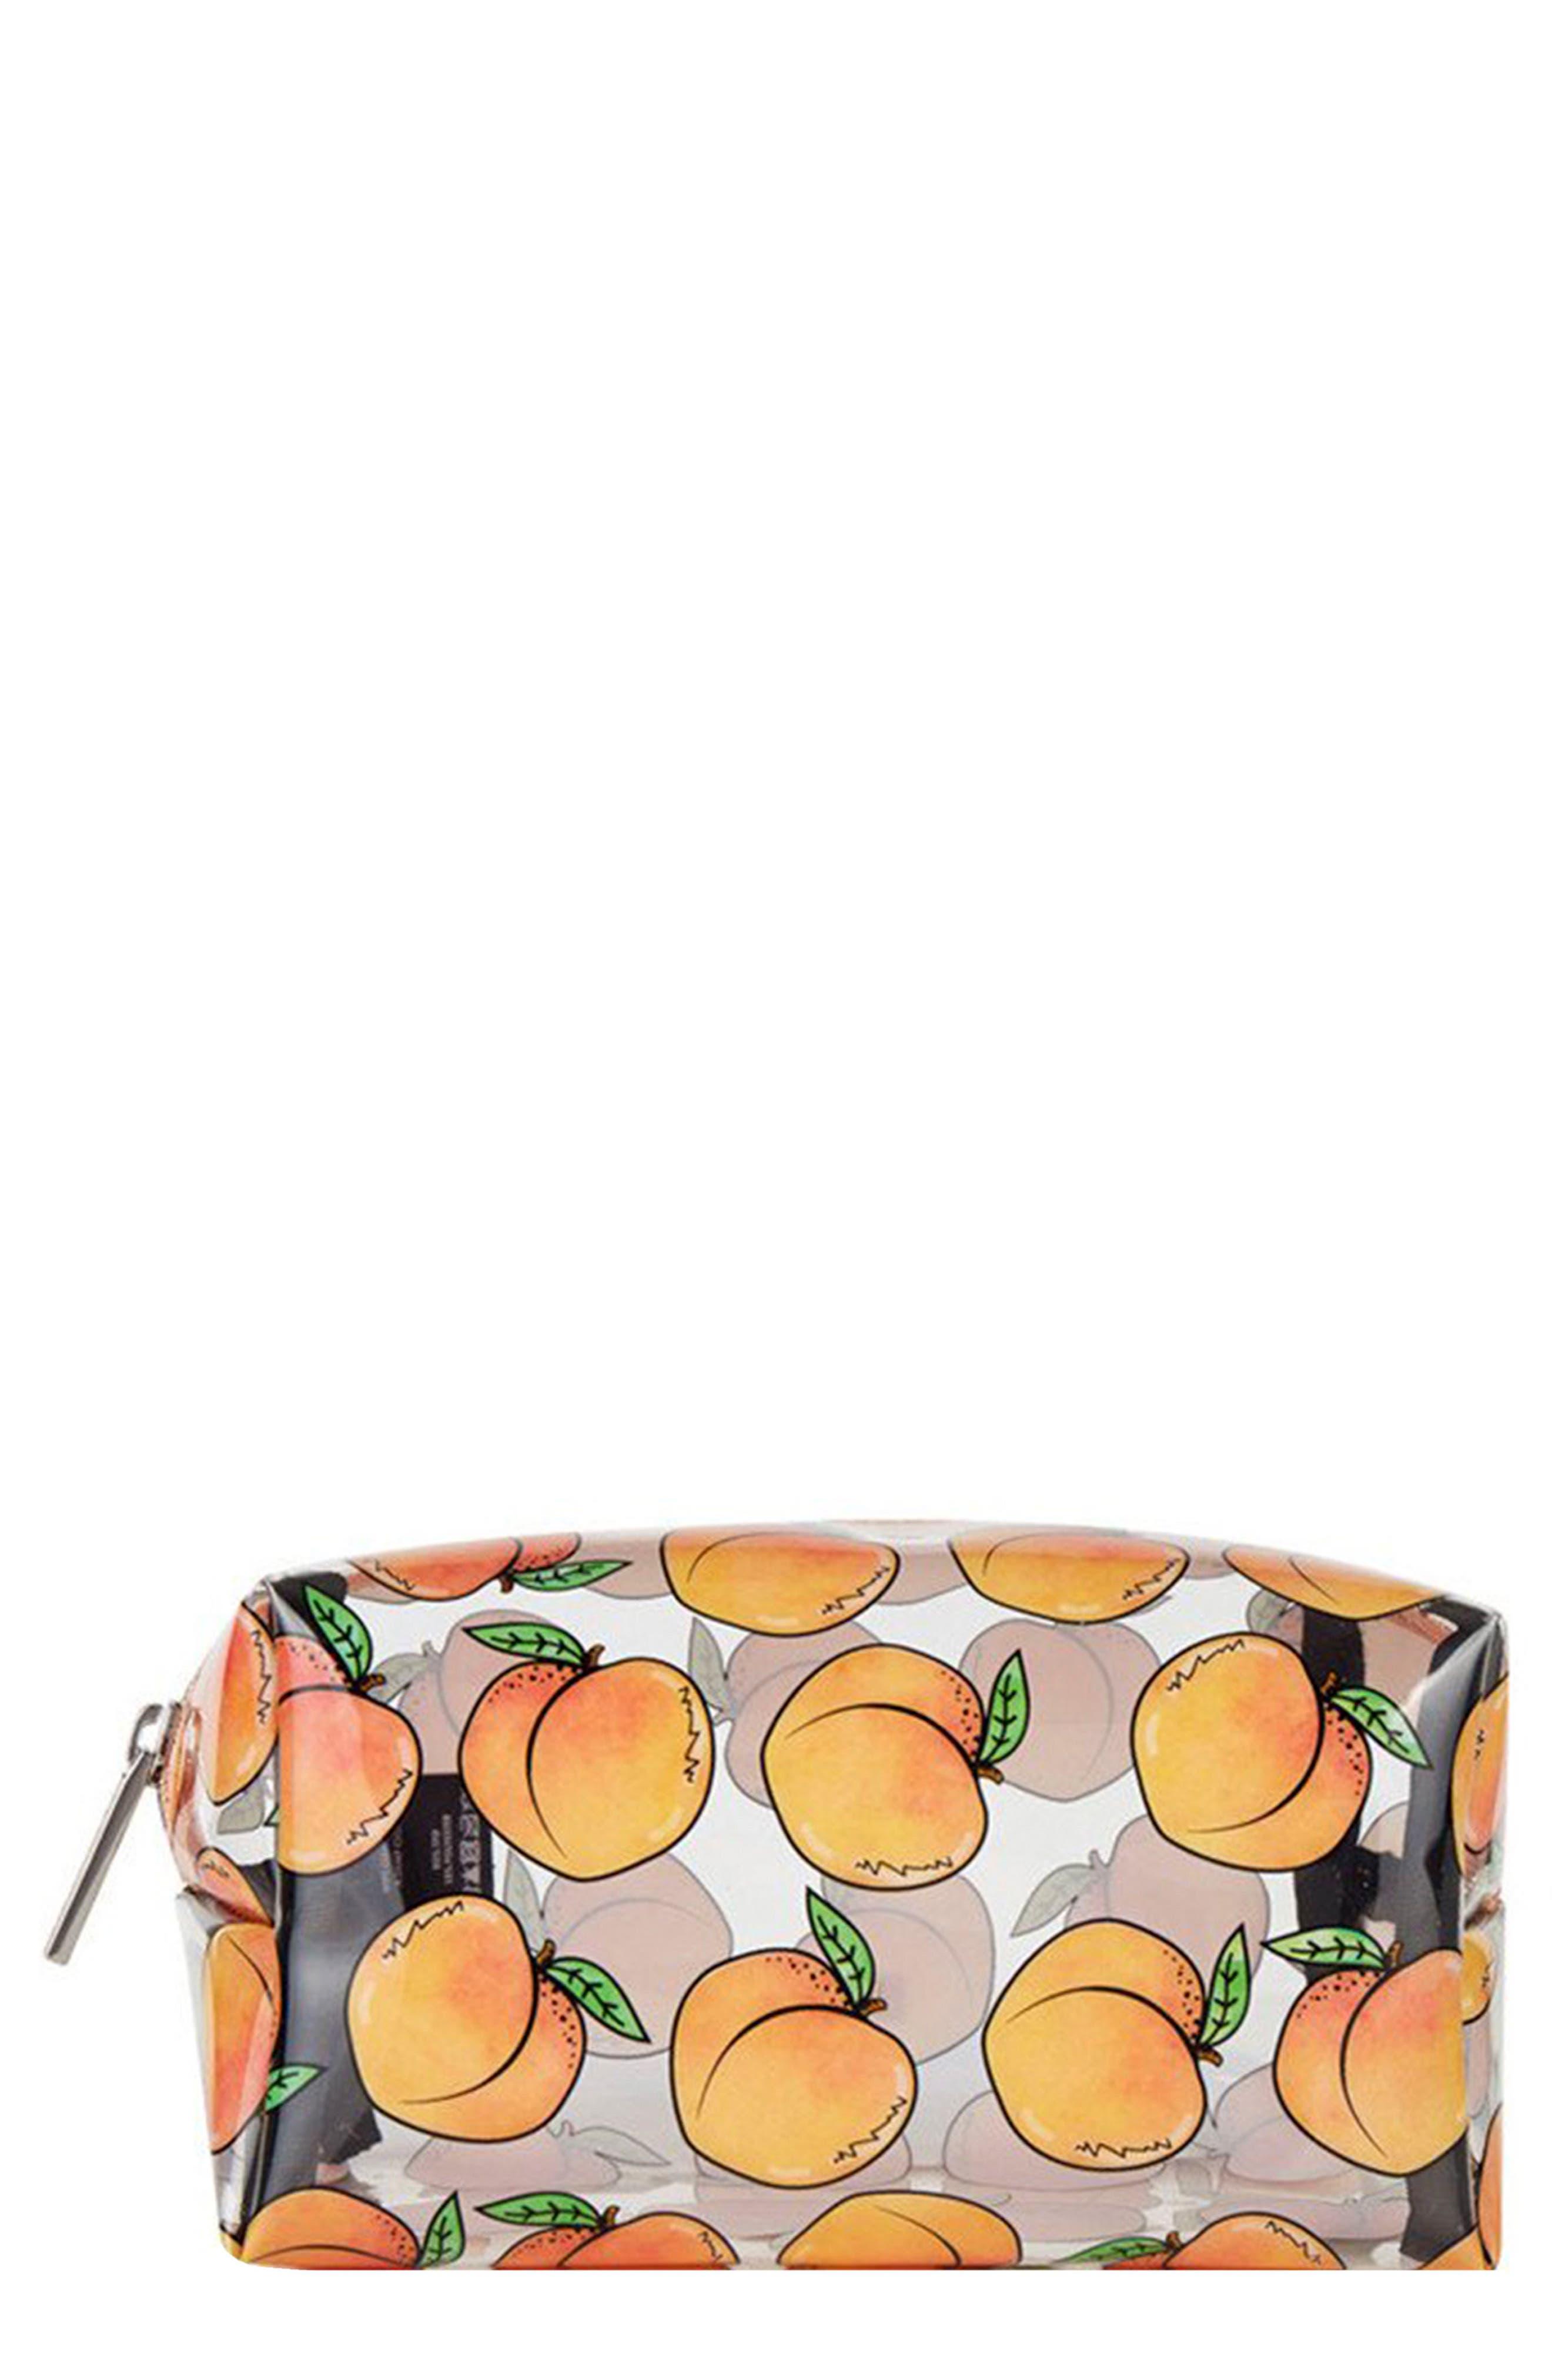 SKINNYDIP,                             Peachy Clear Makeup Bag,                             Main thumbnail 1, color,                             NO COLOR